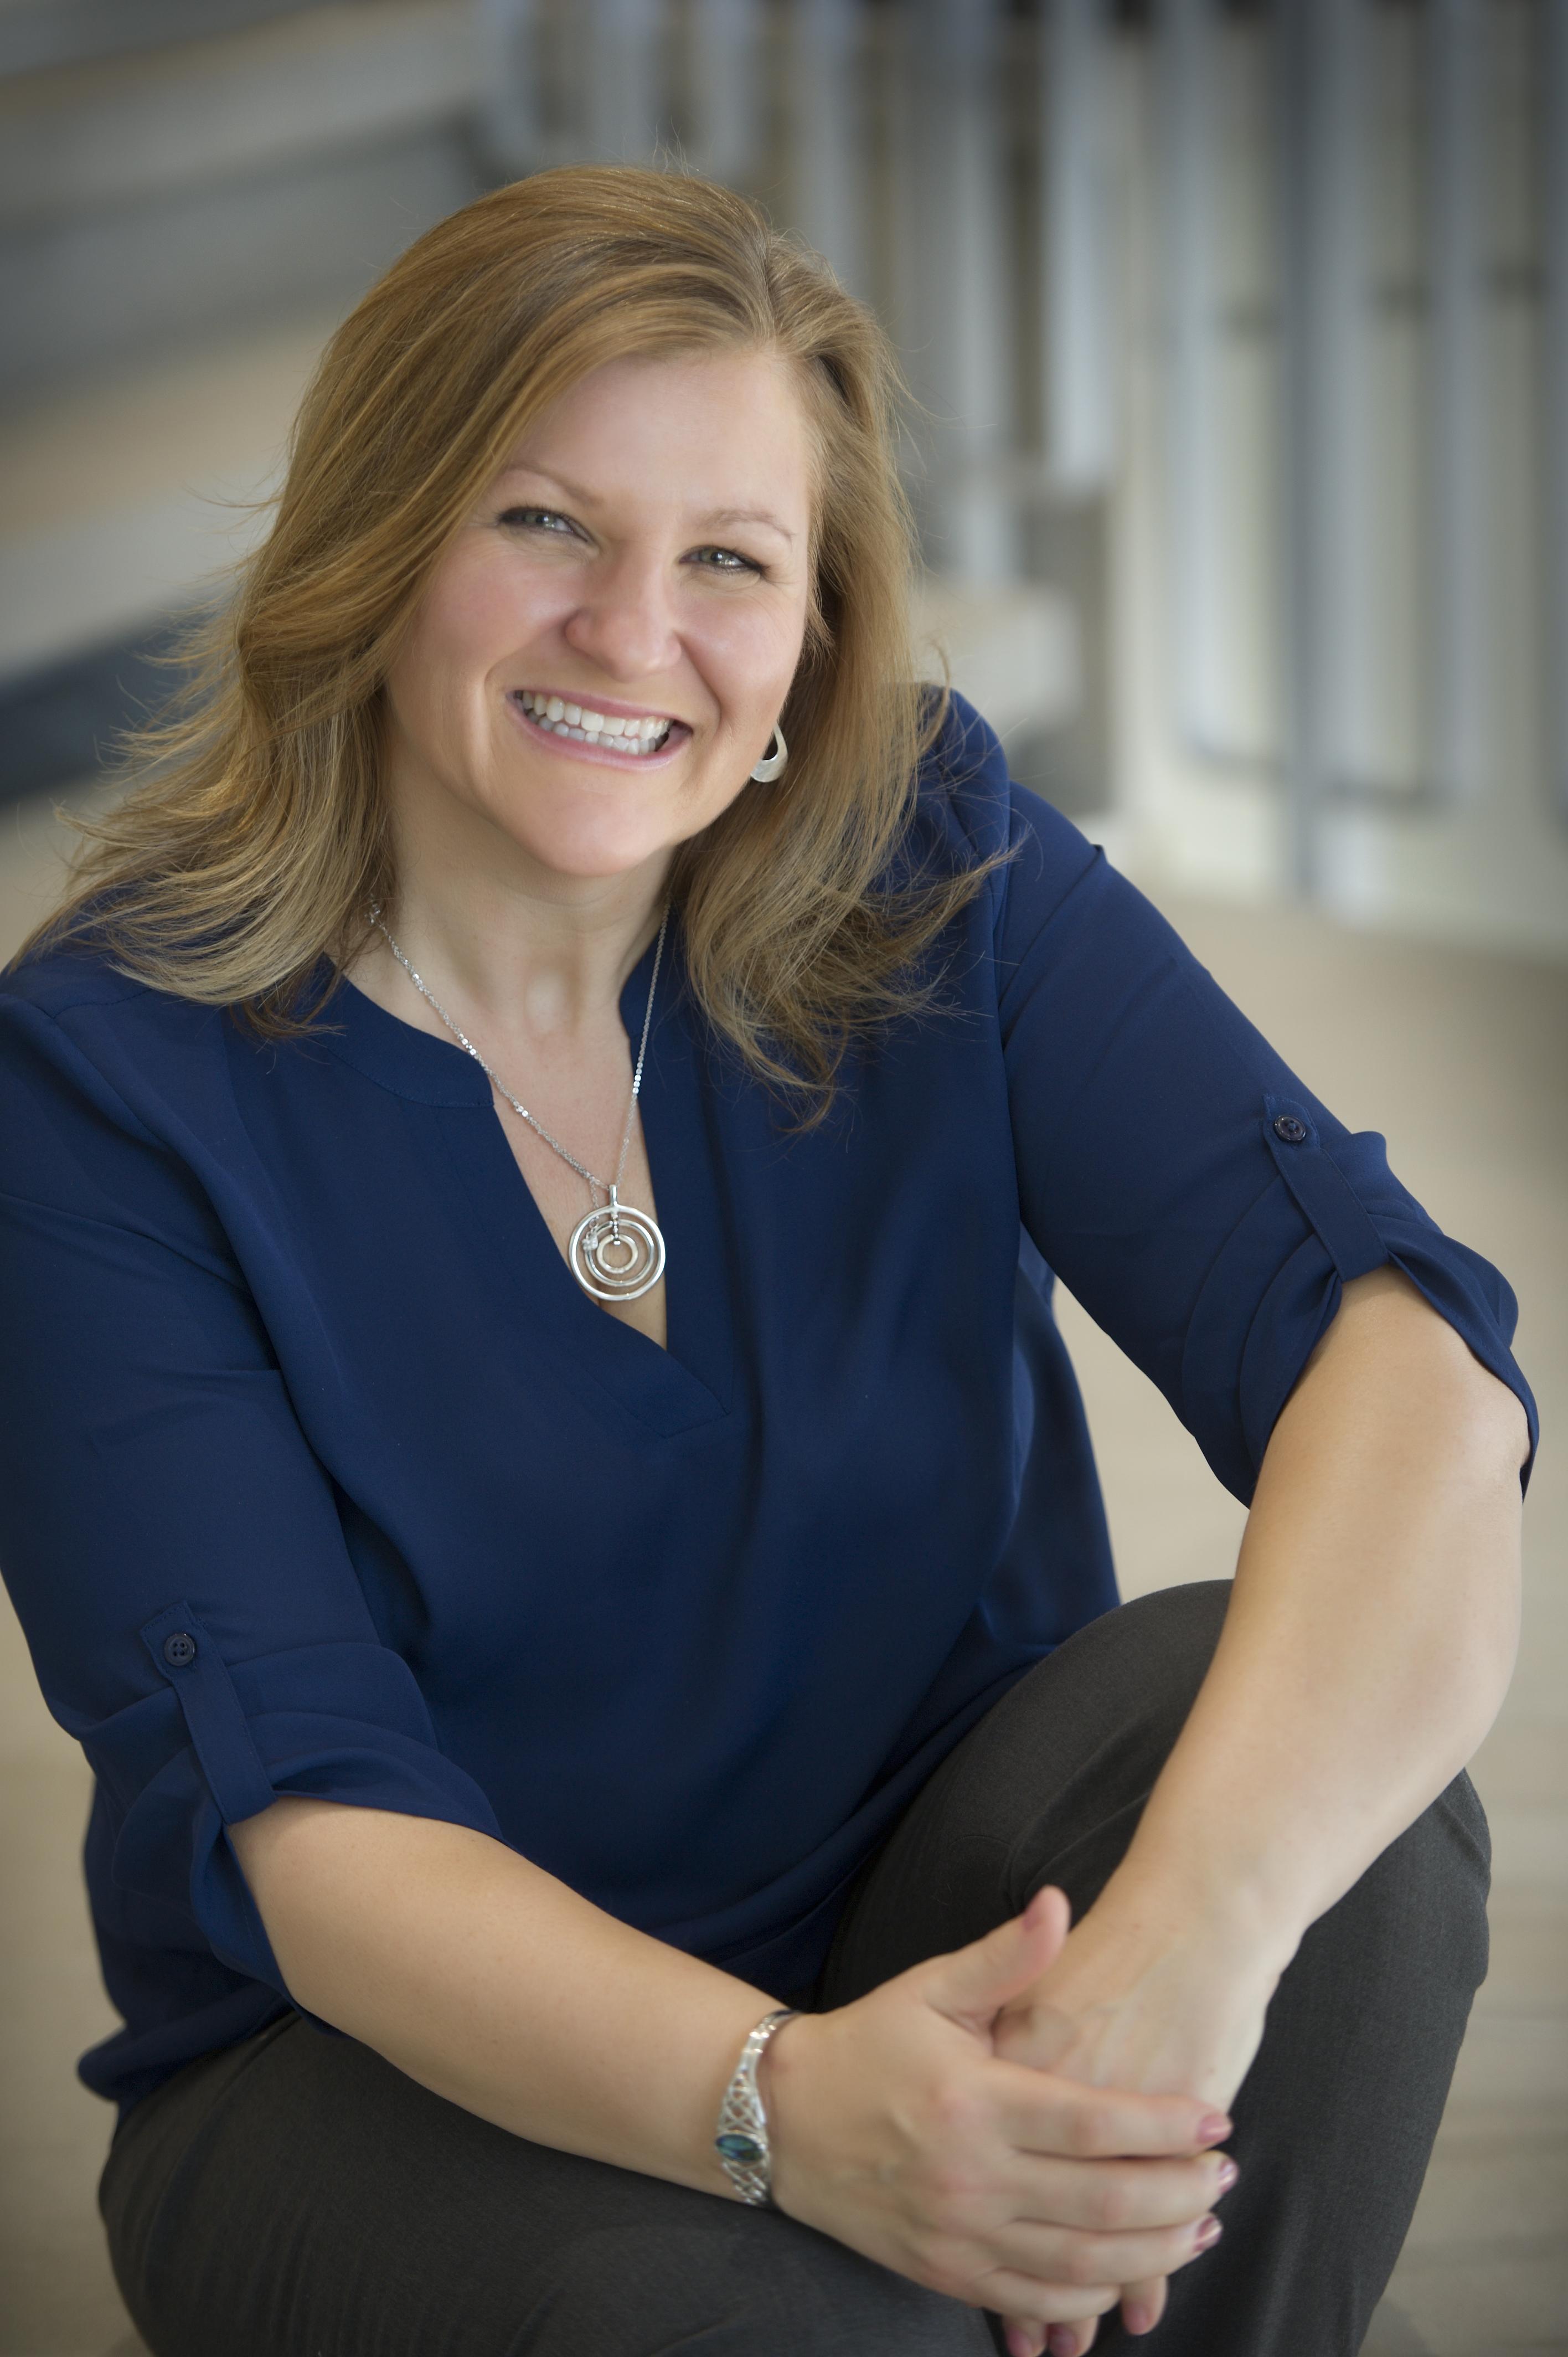 Crystal Mackay Loft32 Founder and CEO